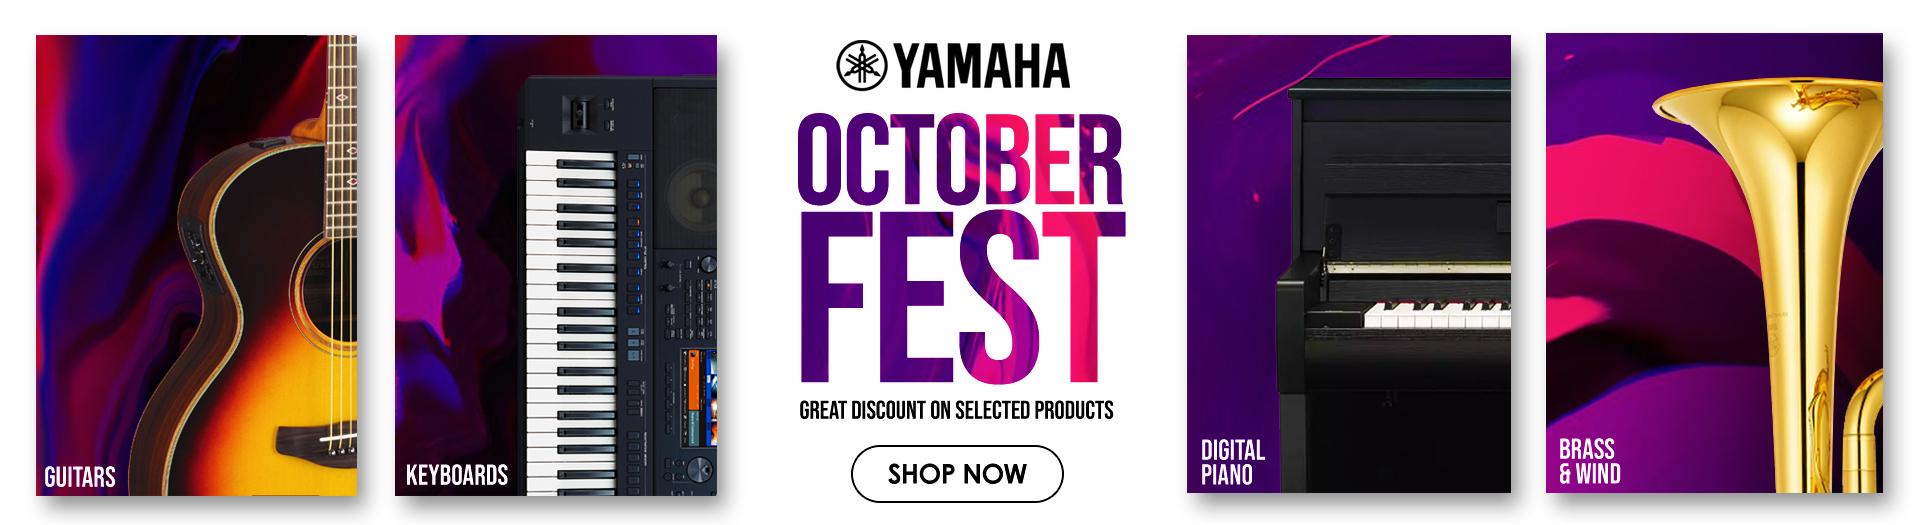 Yamaha October Promotions